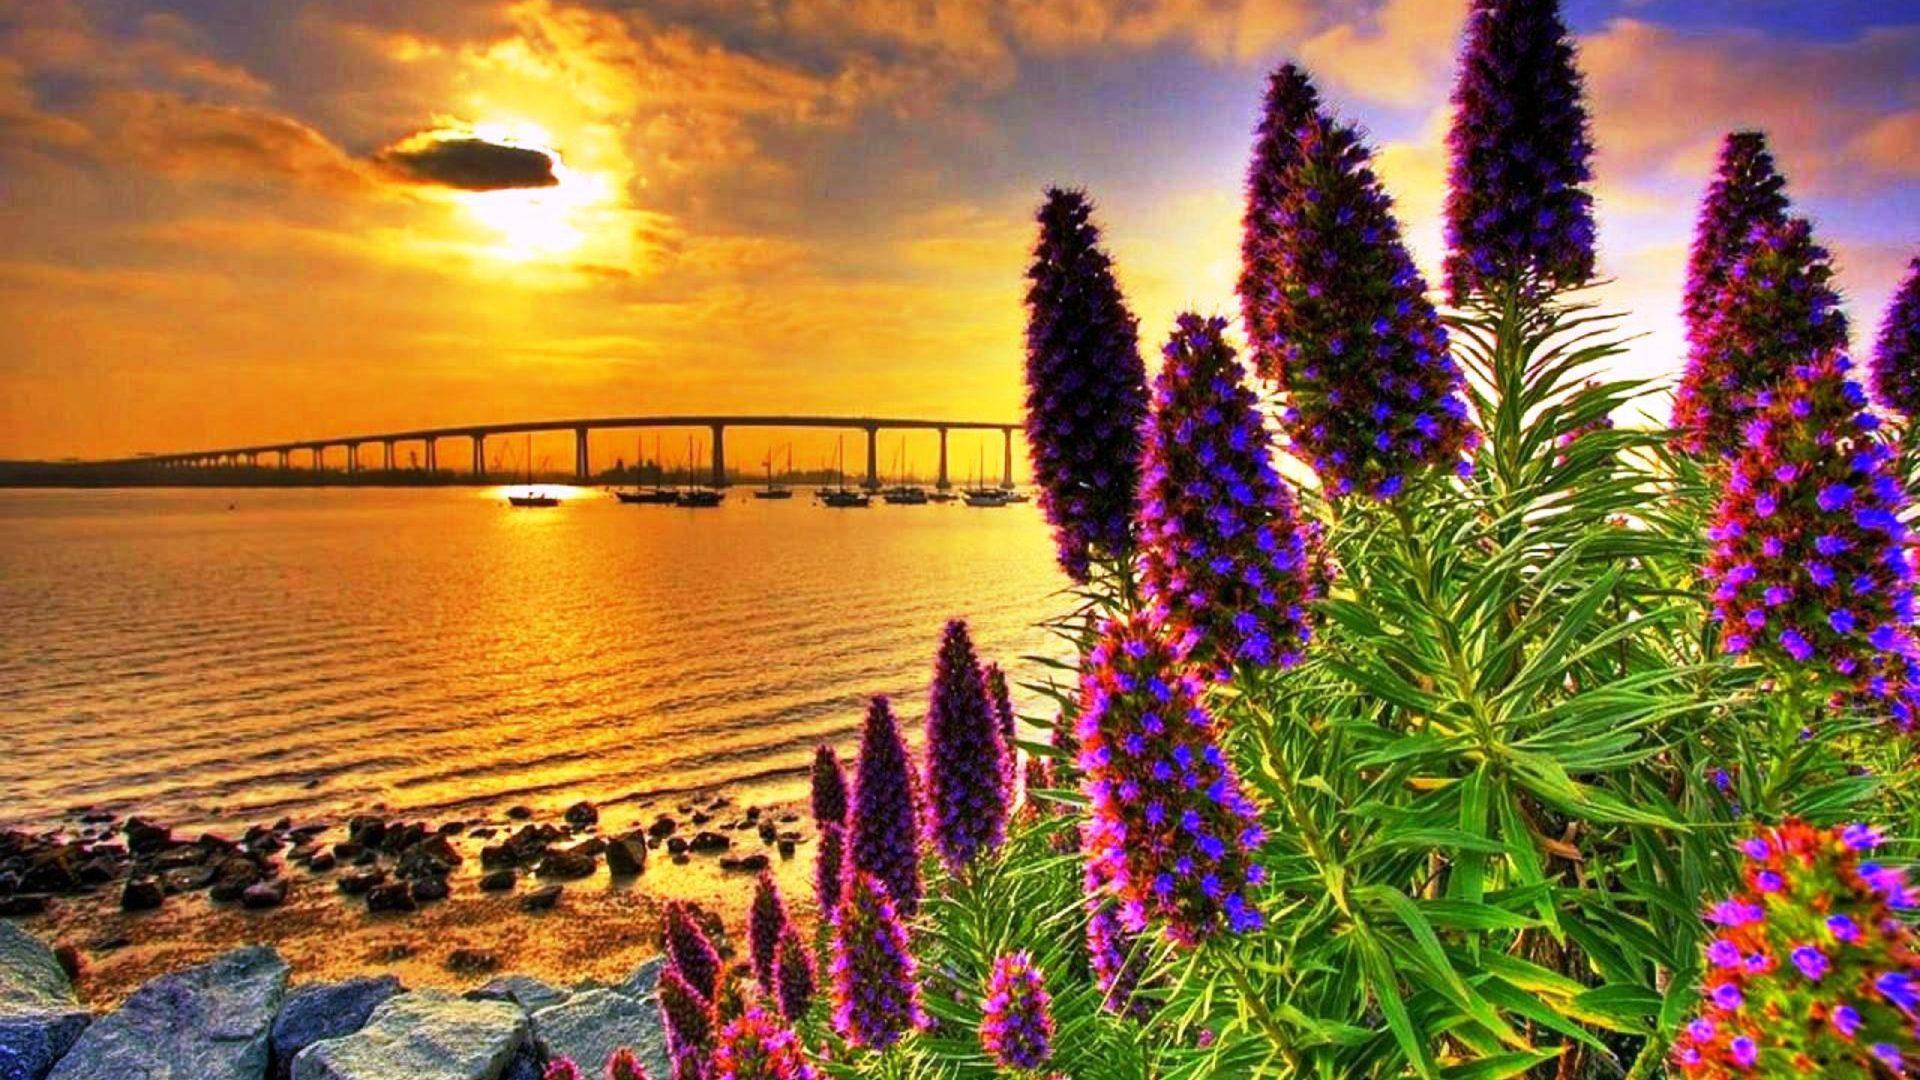 3d Wallpaper Hd 1920x1080 Free Coastal Flowers In Sunset Hd Wallpaper 604544